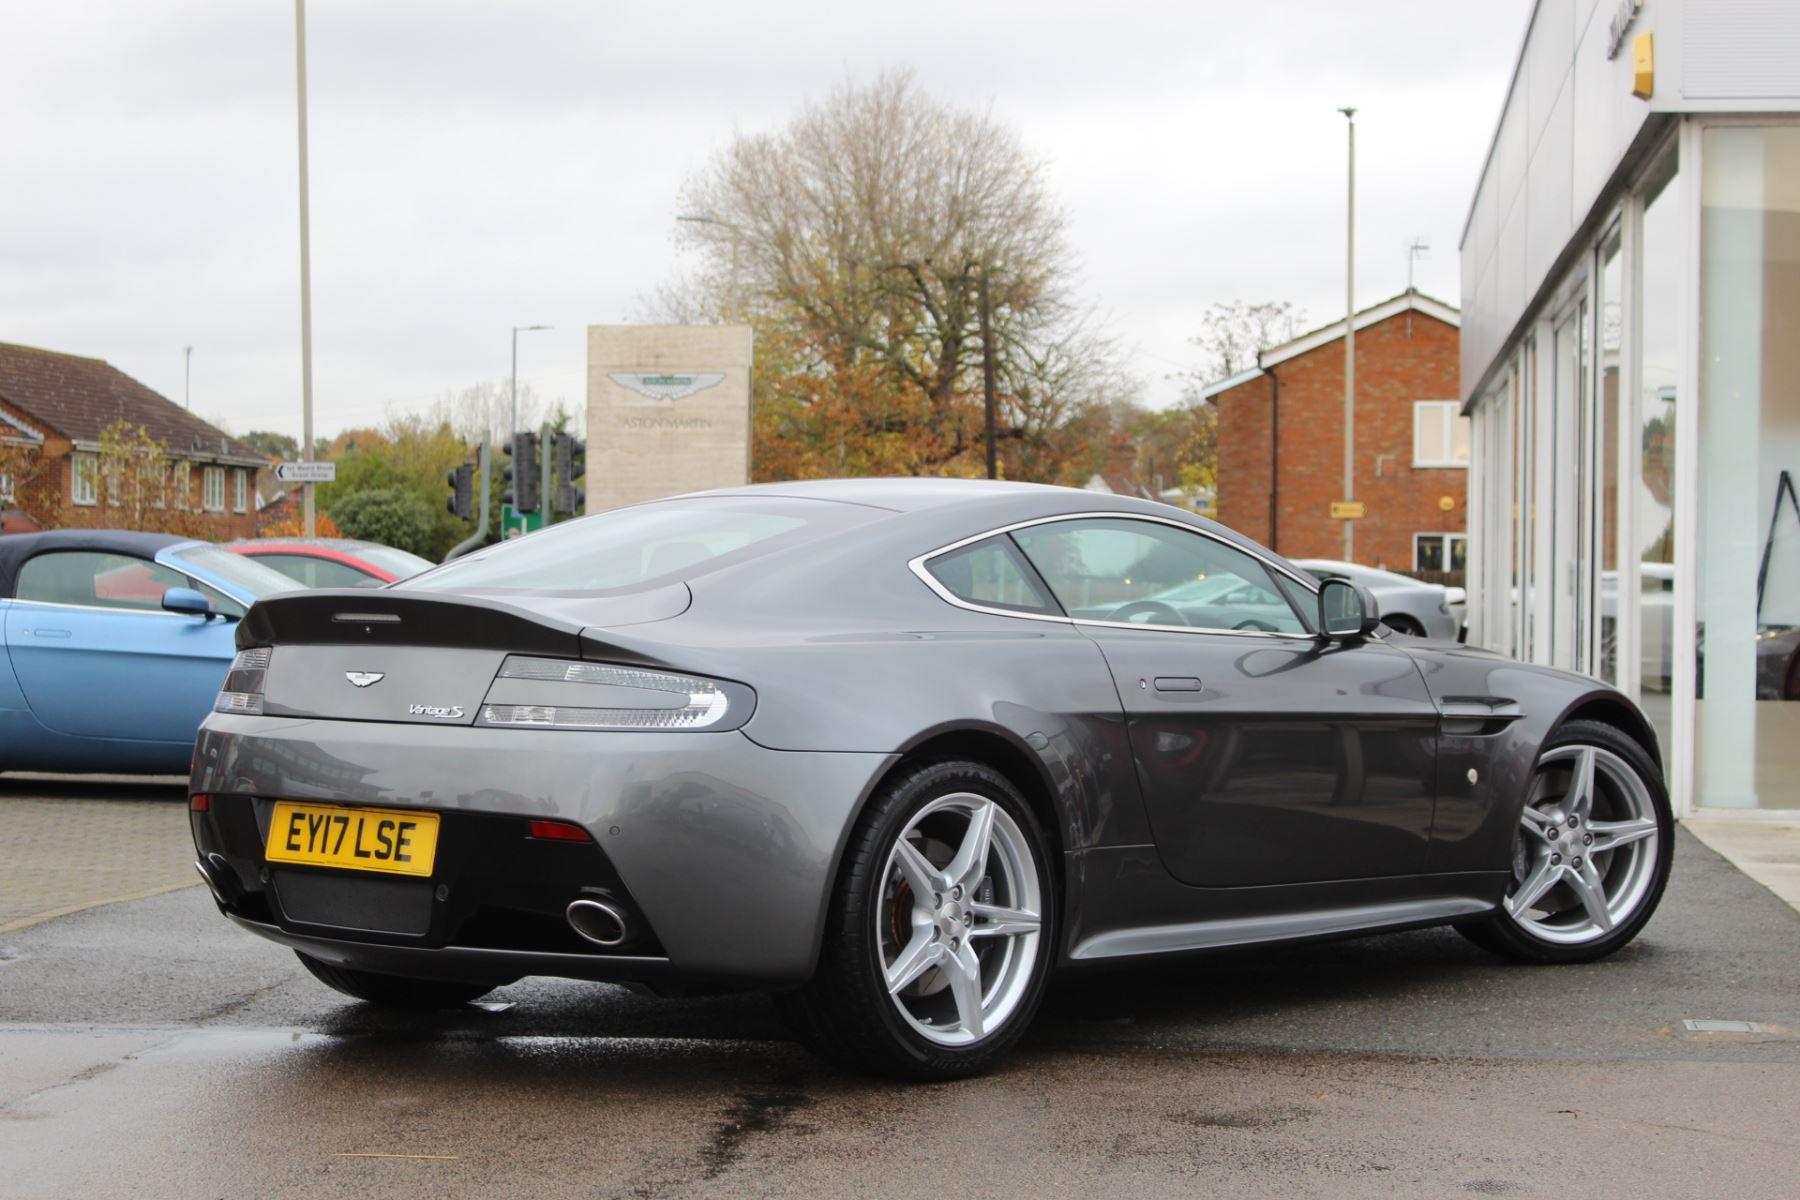 Aston Martin V8 Vantage S Coupe S 2dr Sportshift image 6